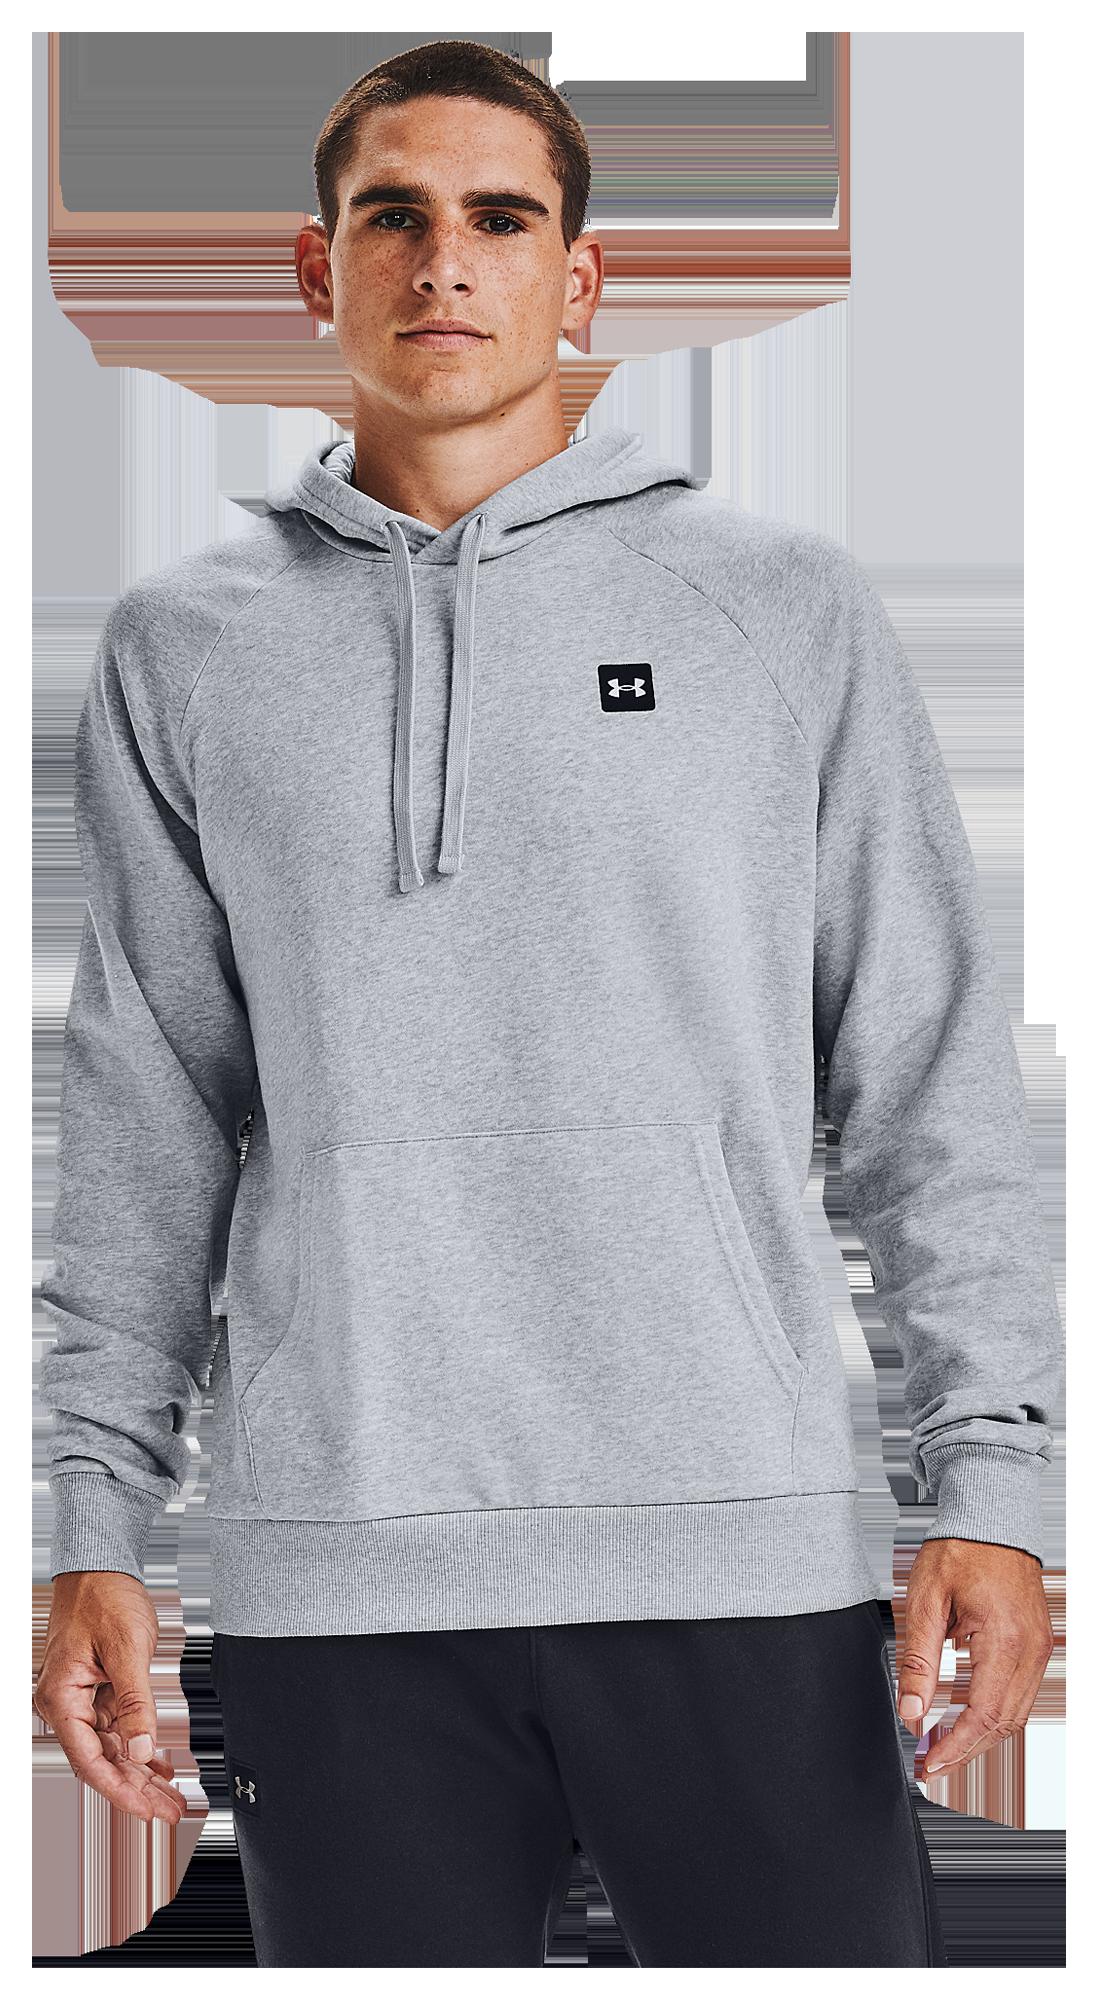 Under Armour Rival Fleece LC Logo Hoodie - Mens / Mod Grey Lt Heather/Onyx White